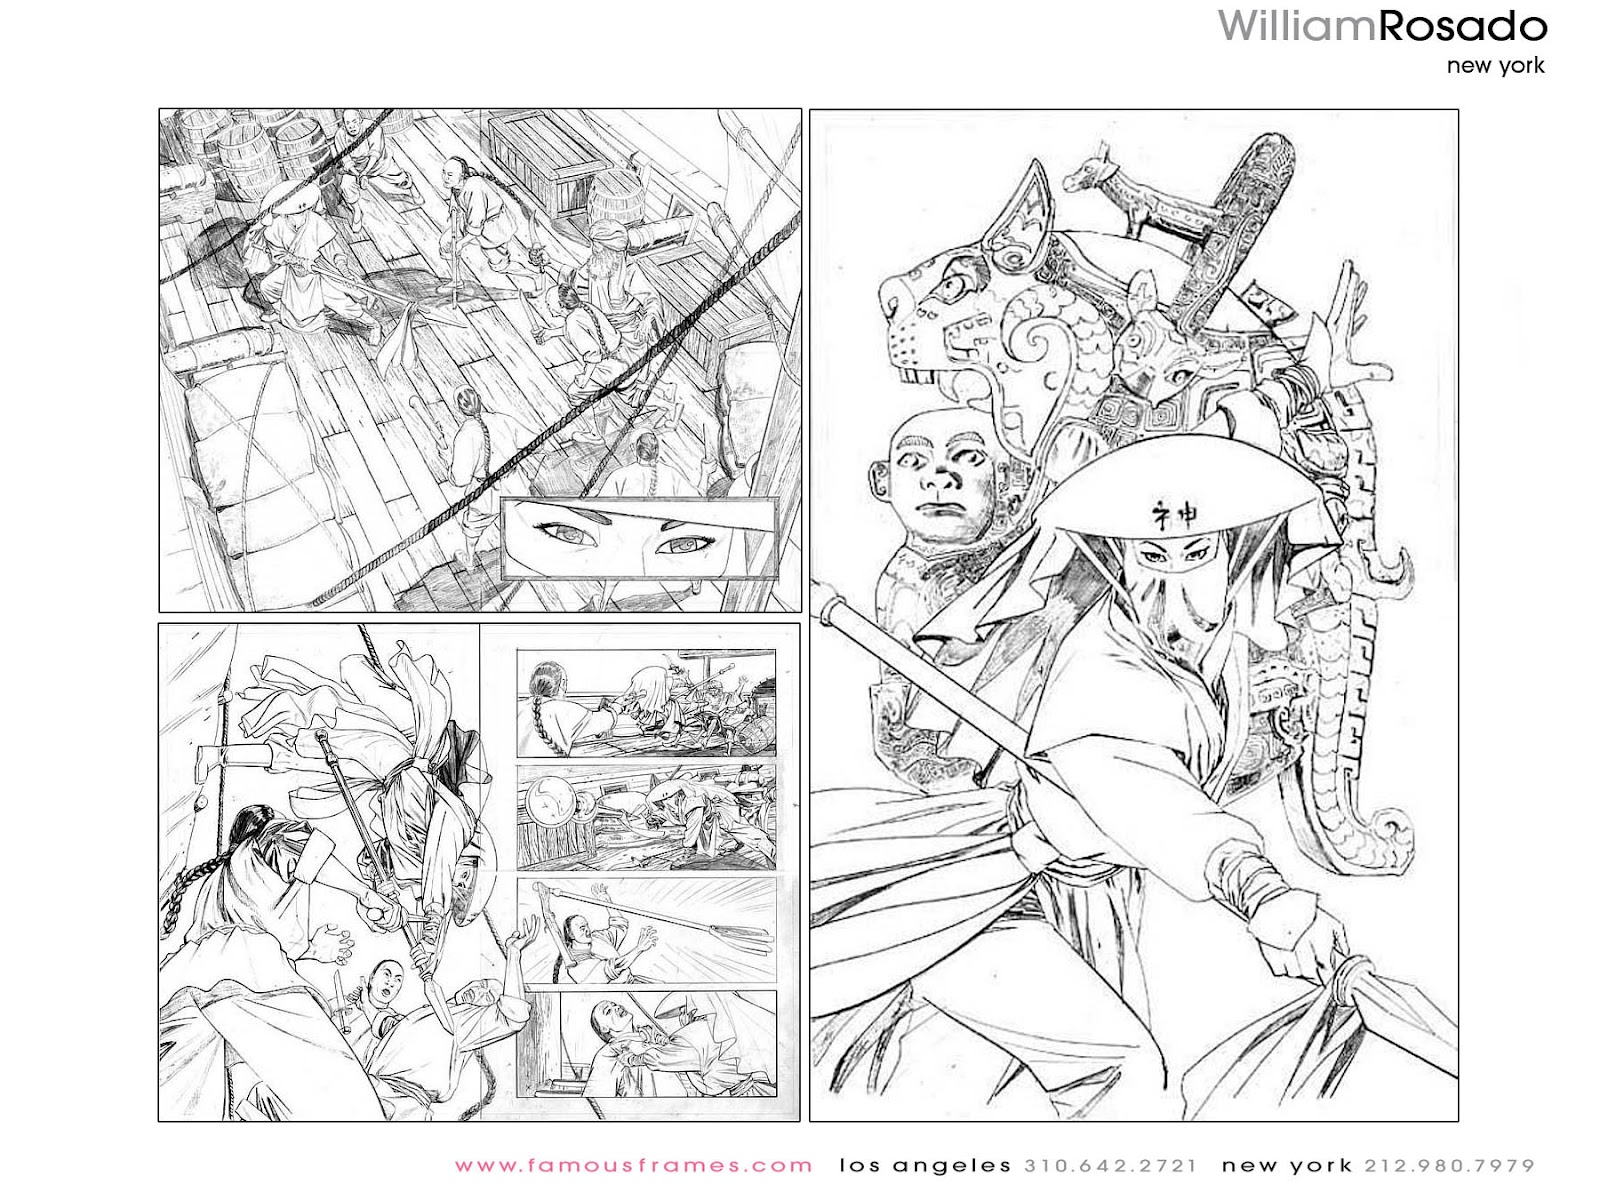 Storyboard Heroes: Famous Frames writeup: William Rosado